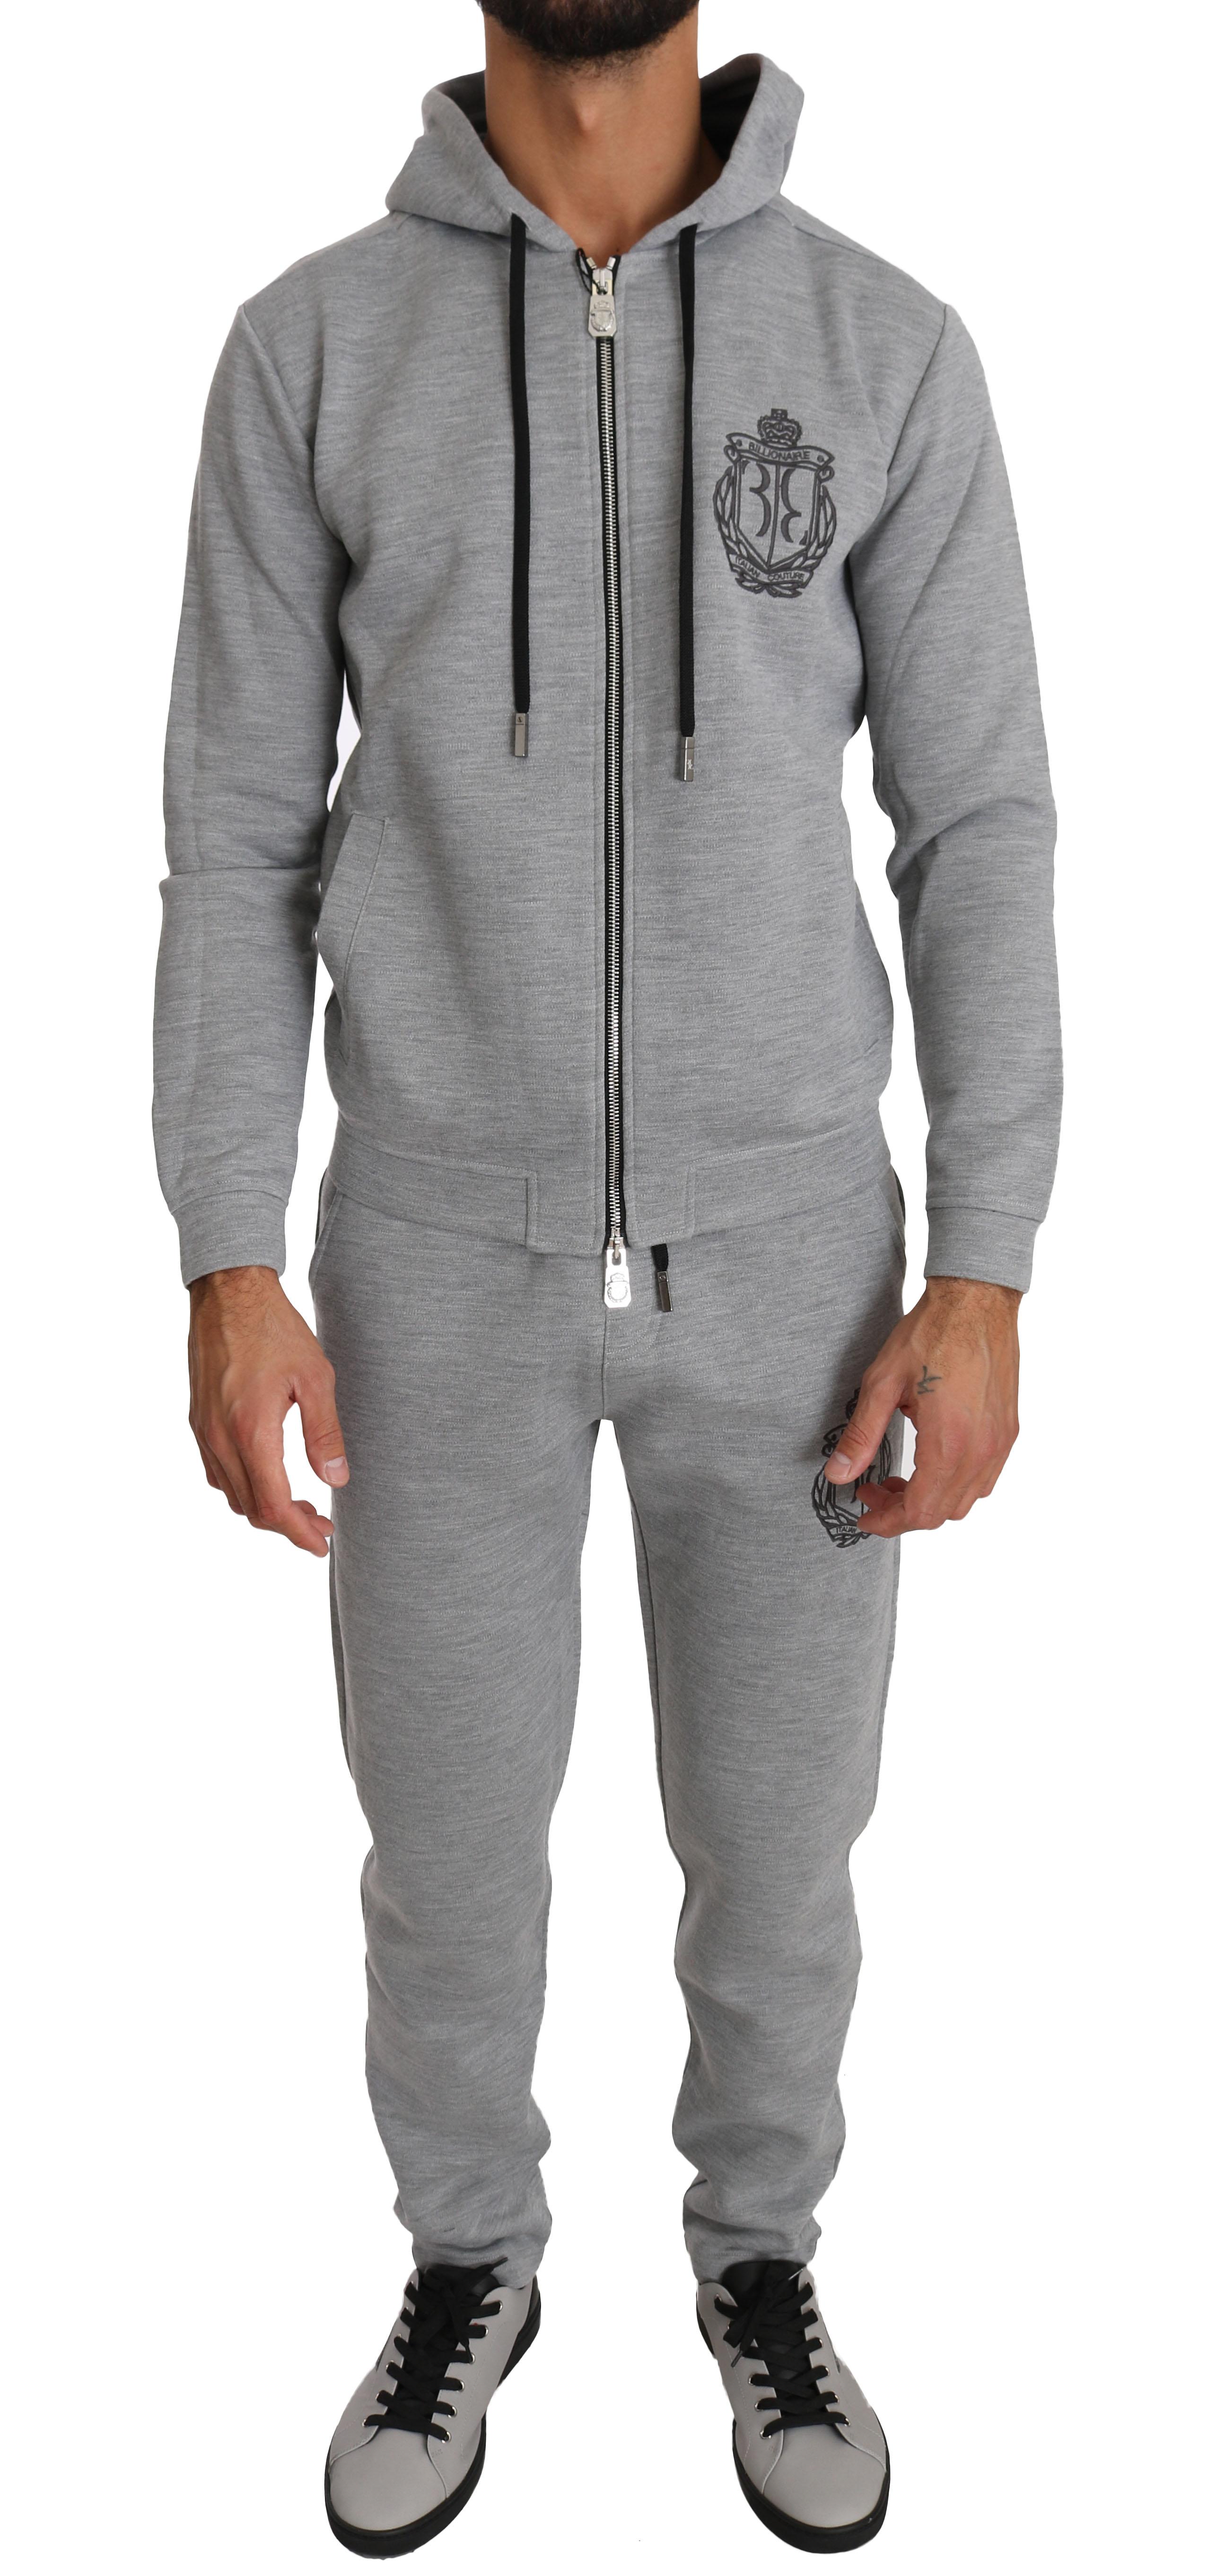 Billionaire Italian Couture Men's Hoodie Tracksuit Grey BIL1019 - IT60   3XL